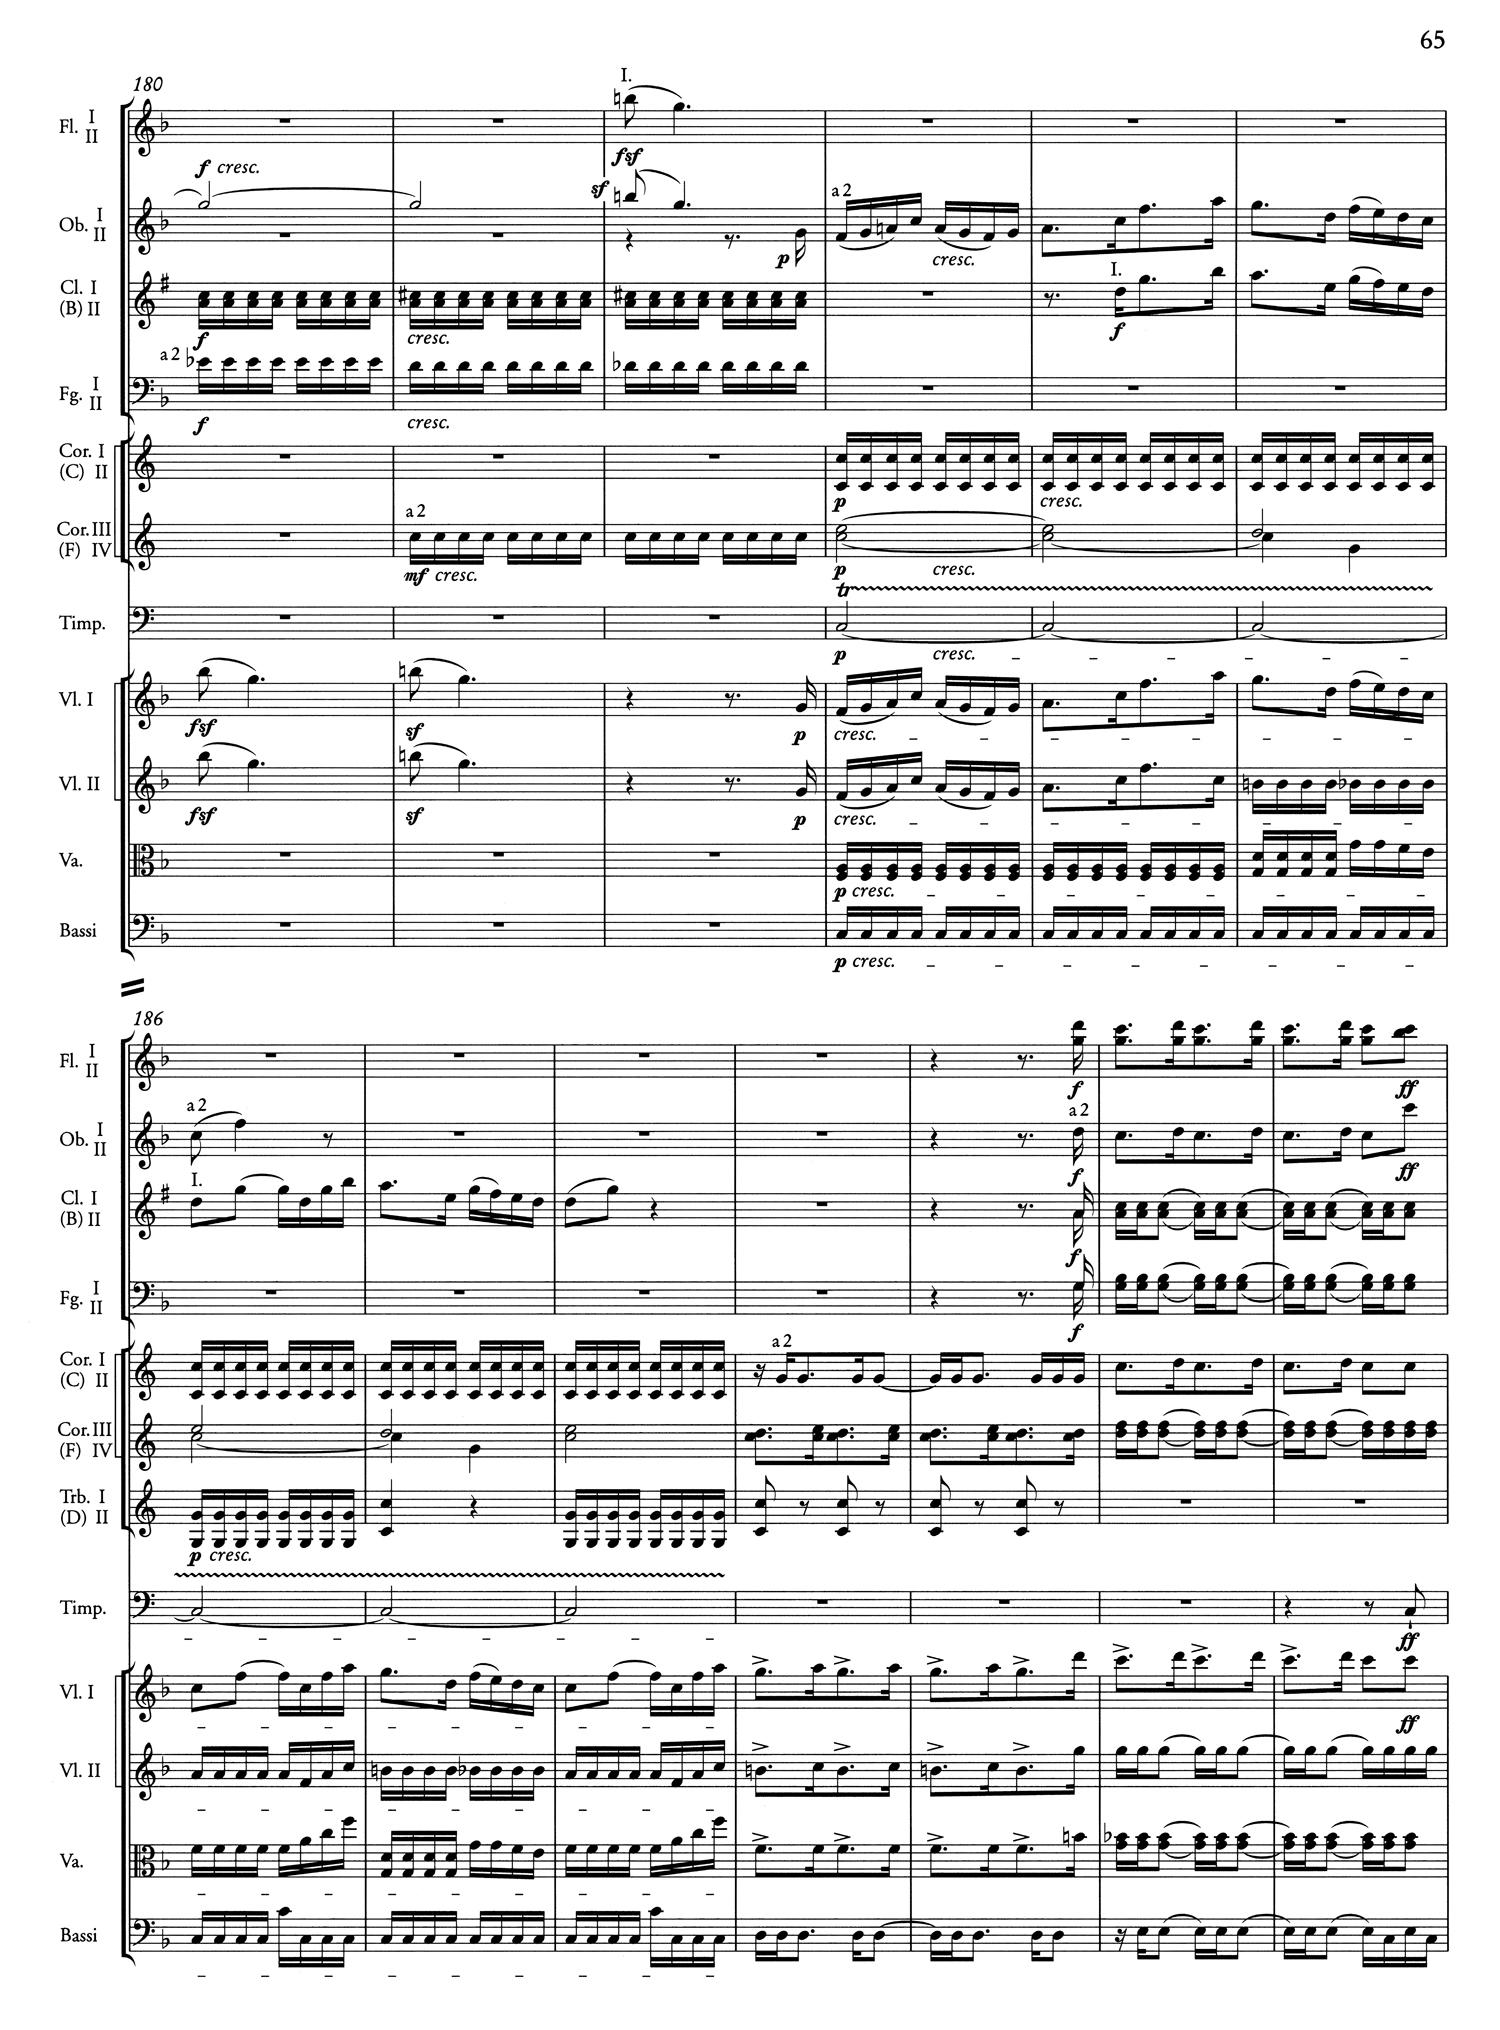 Mendelssohn Score 2 Page 1.jpg